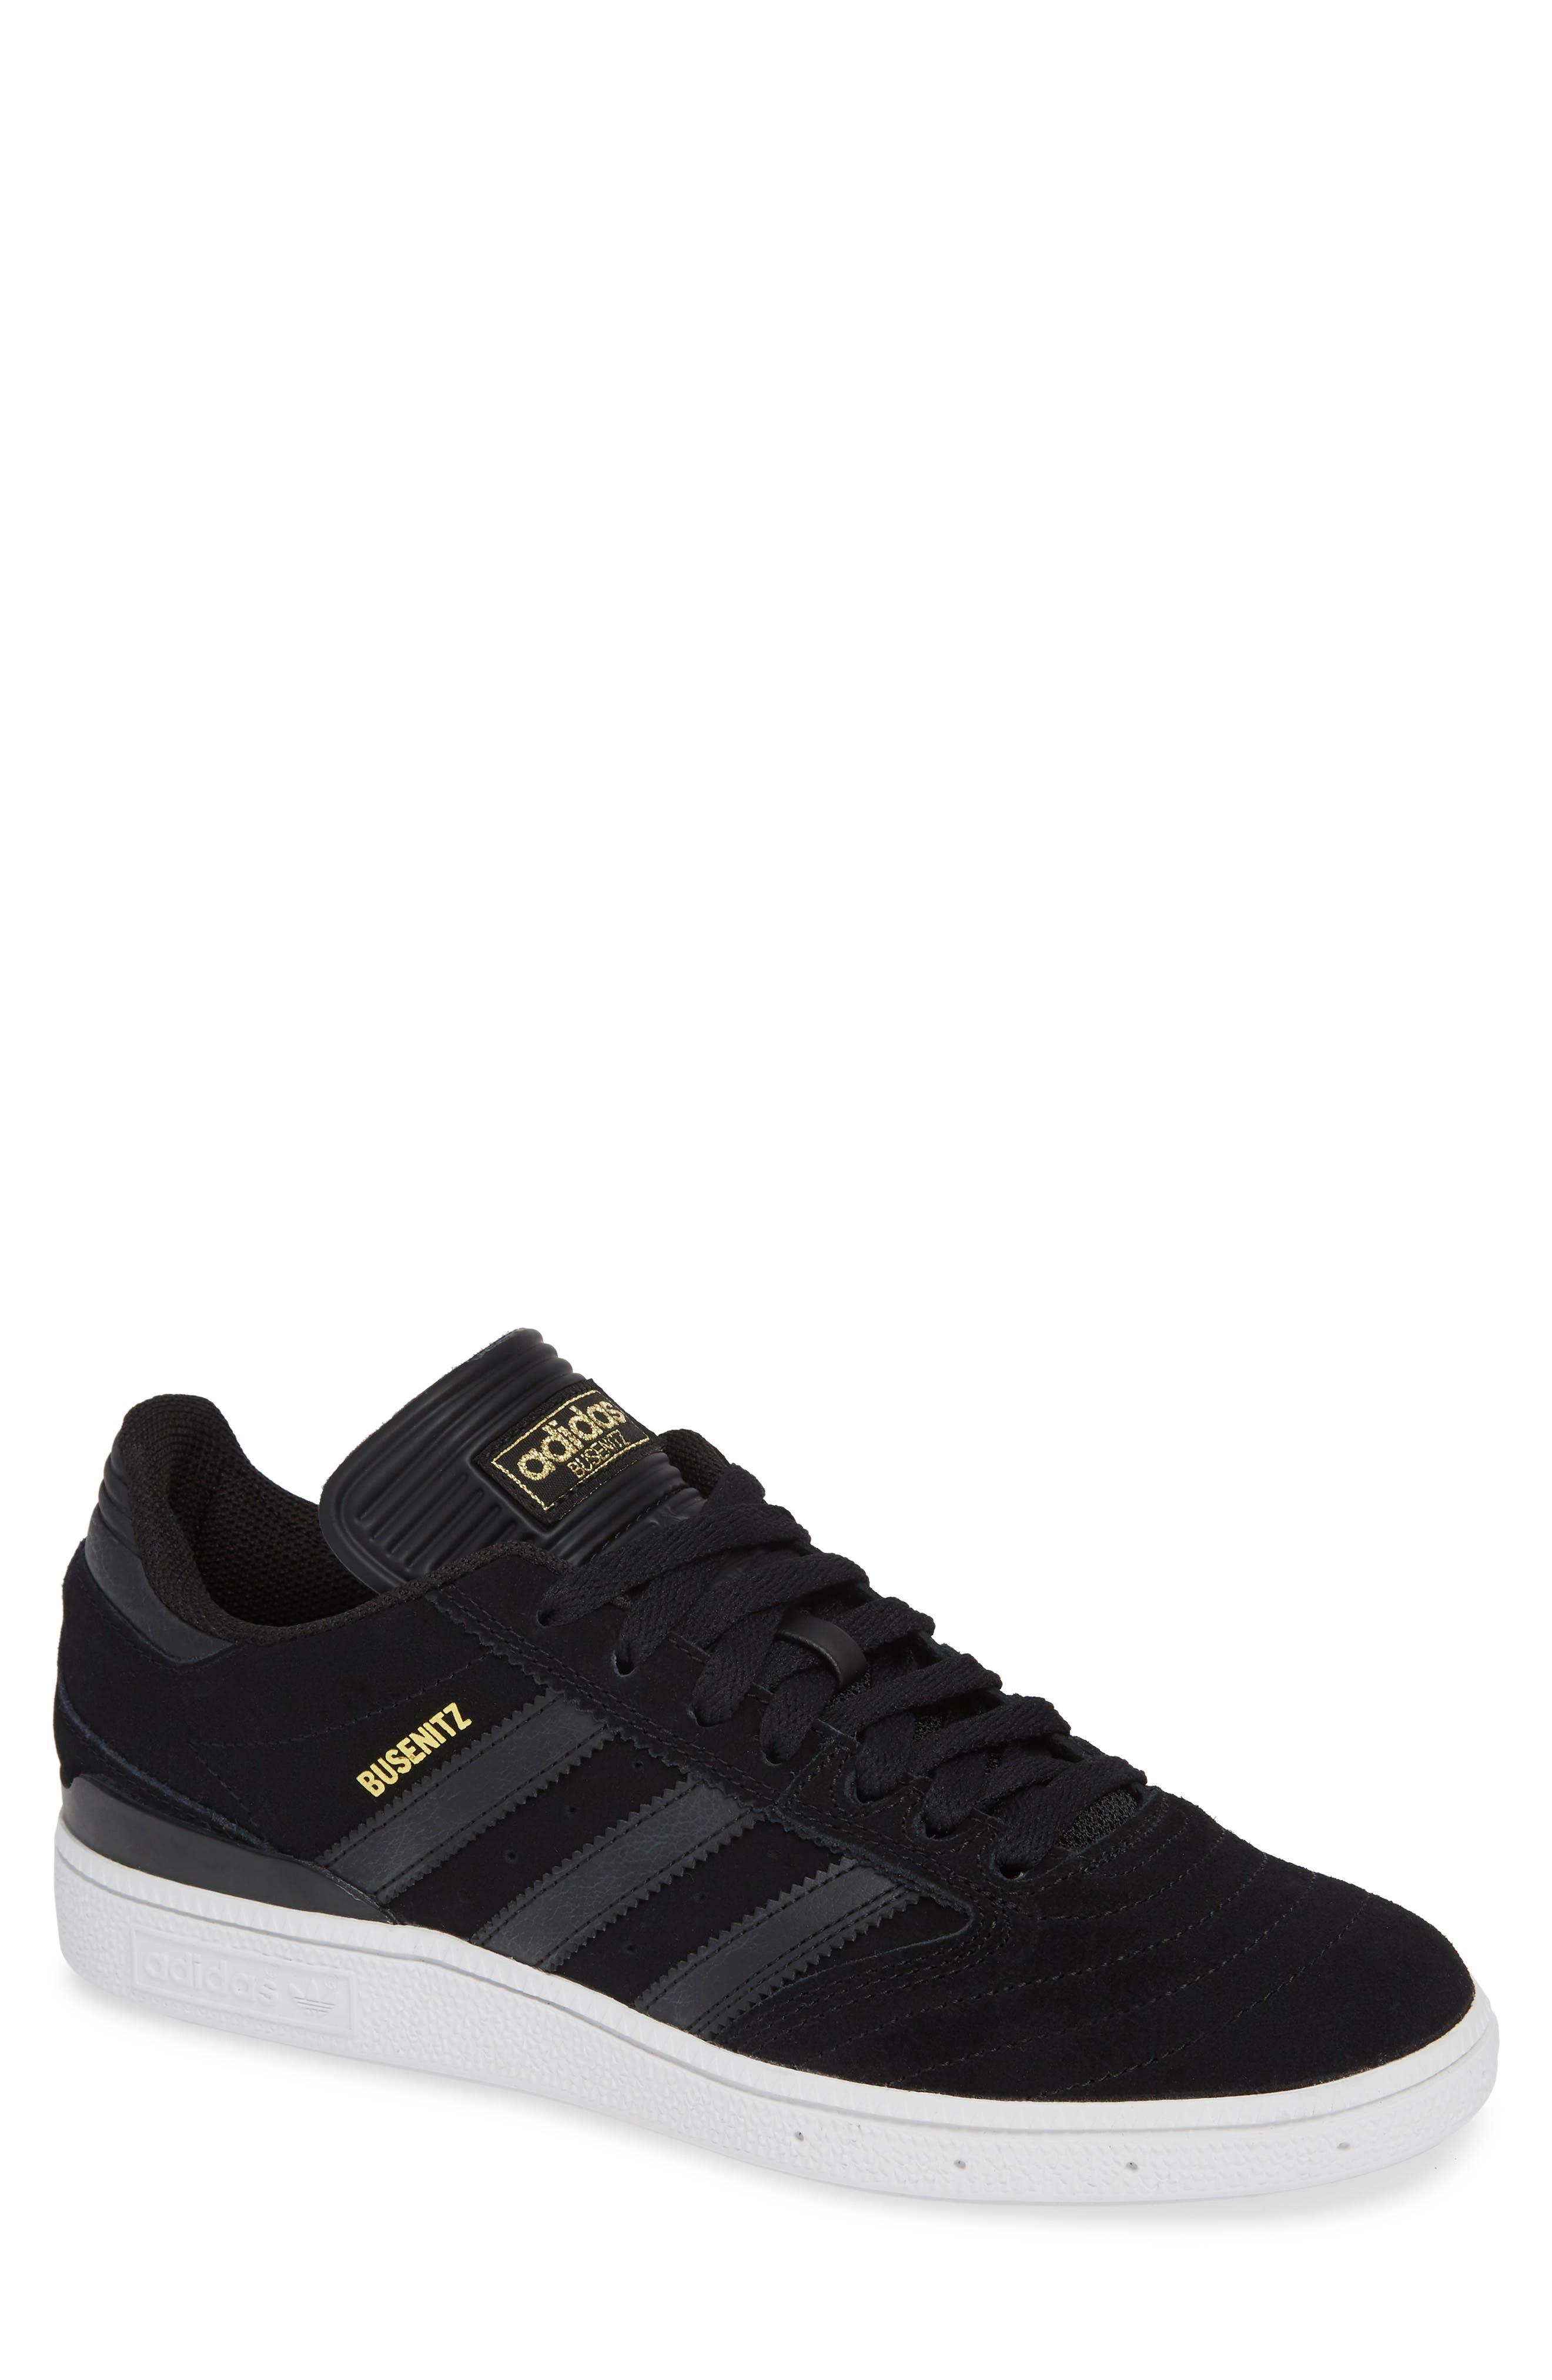 Busenitz Sneaker,                         Main,                         color, BLACK/ BLACK/ WHITE